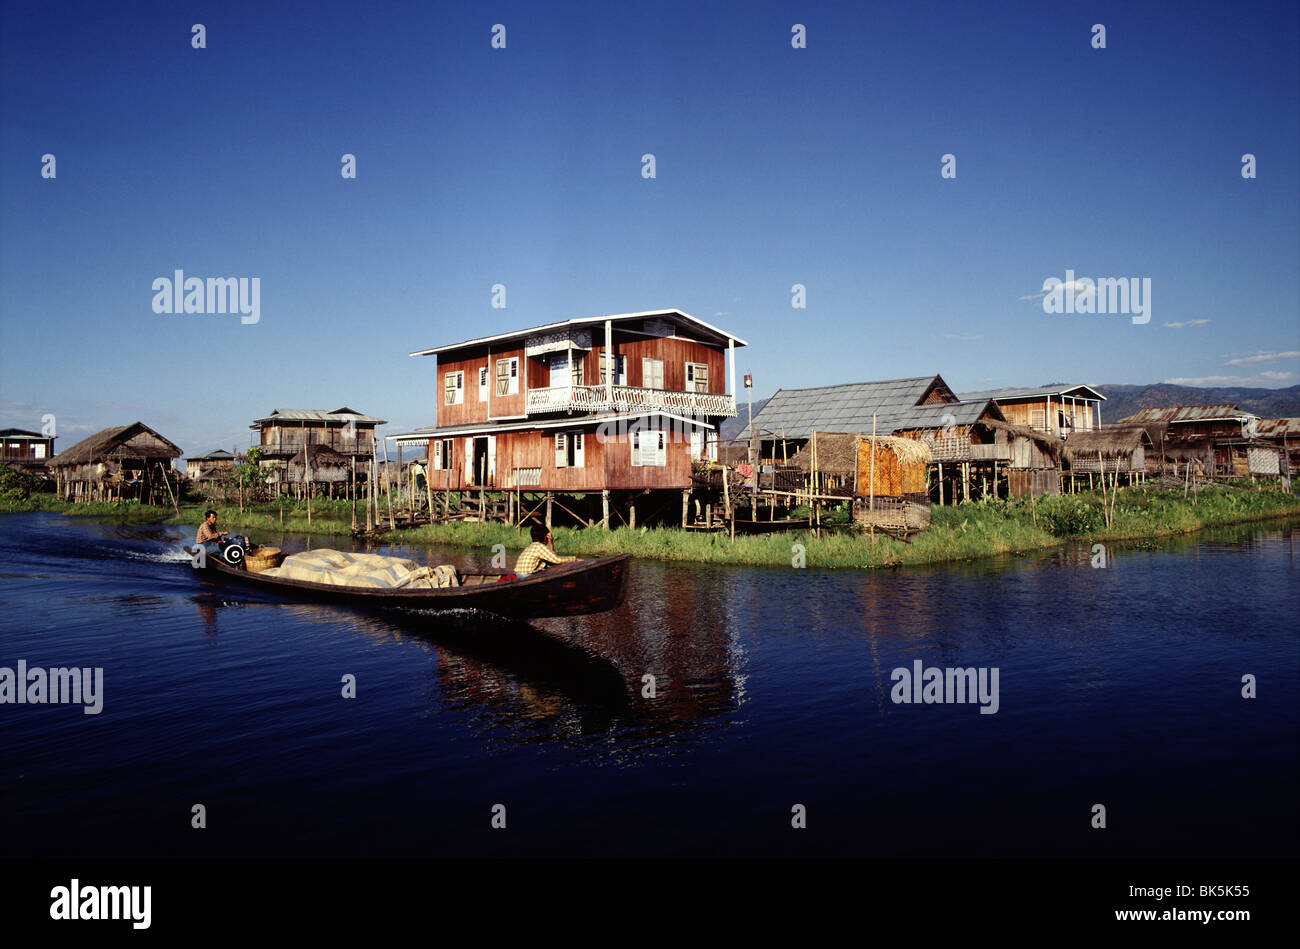 Inle Lake, Shan State, Myanmar (Burma), Asia - Stock Image